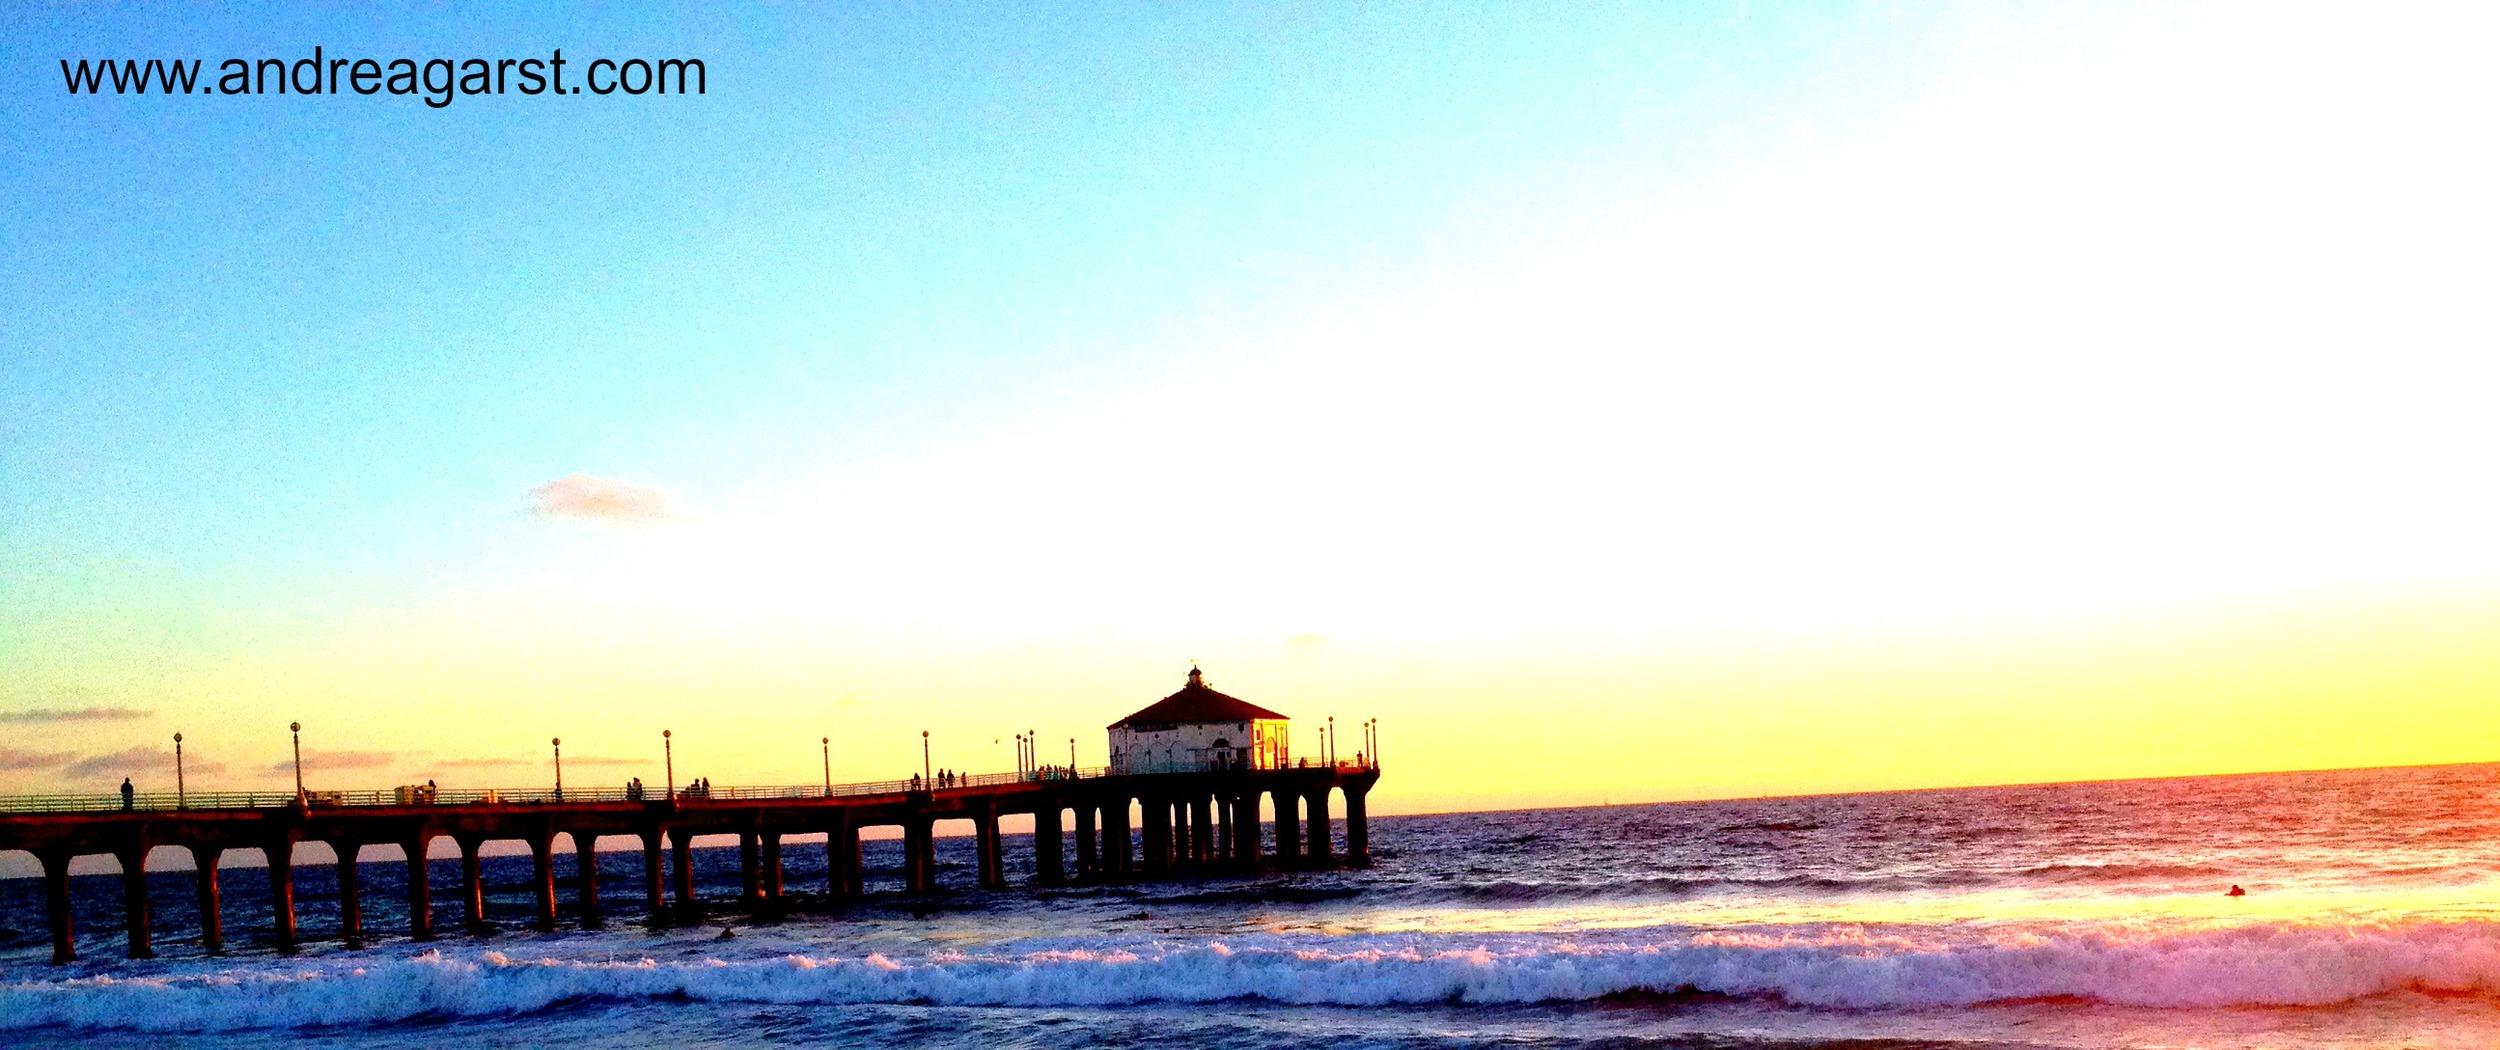 sunset pier 9.19.14